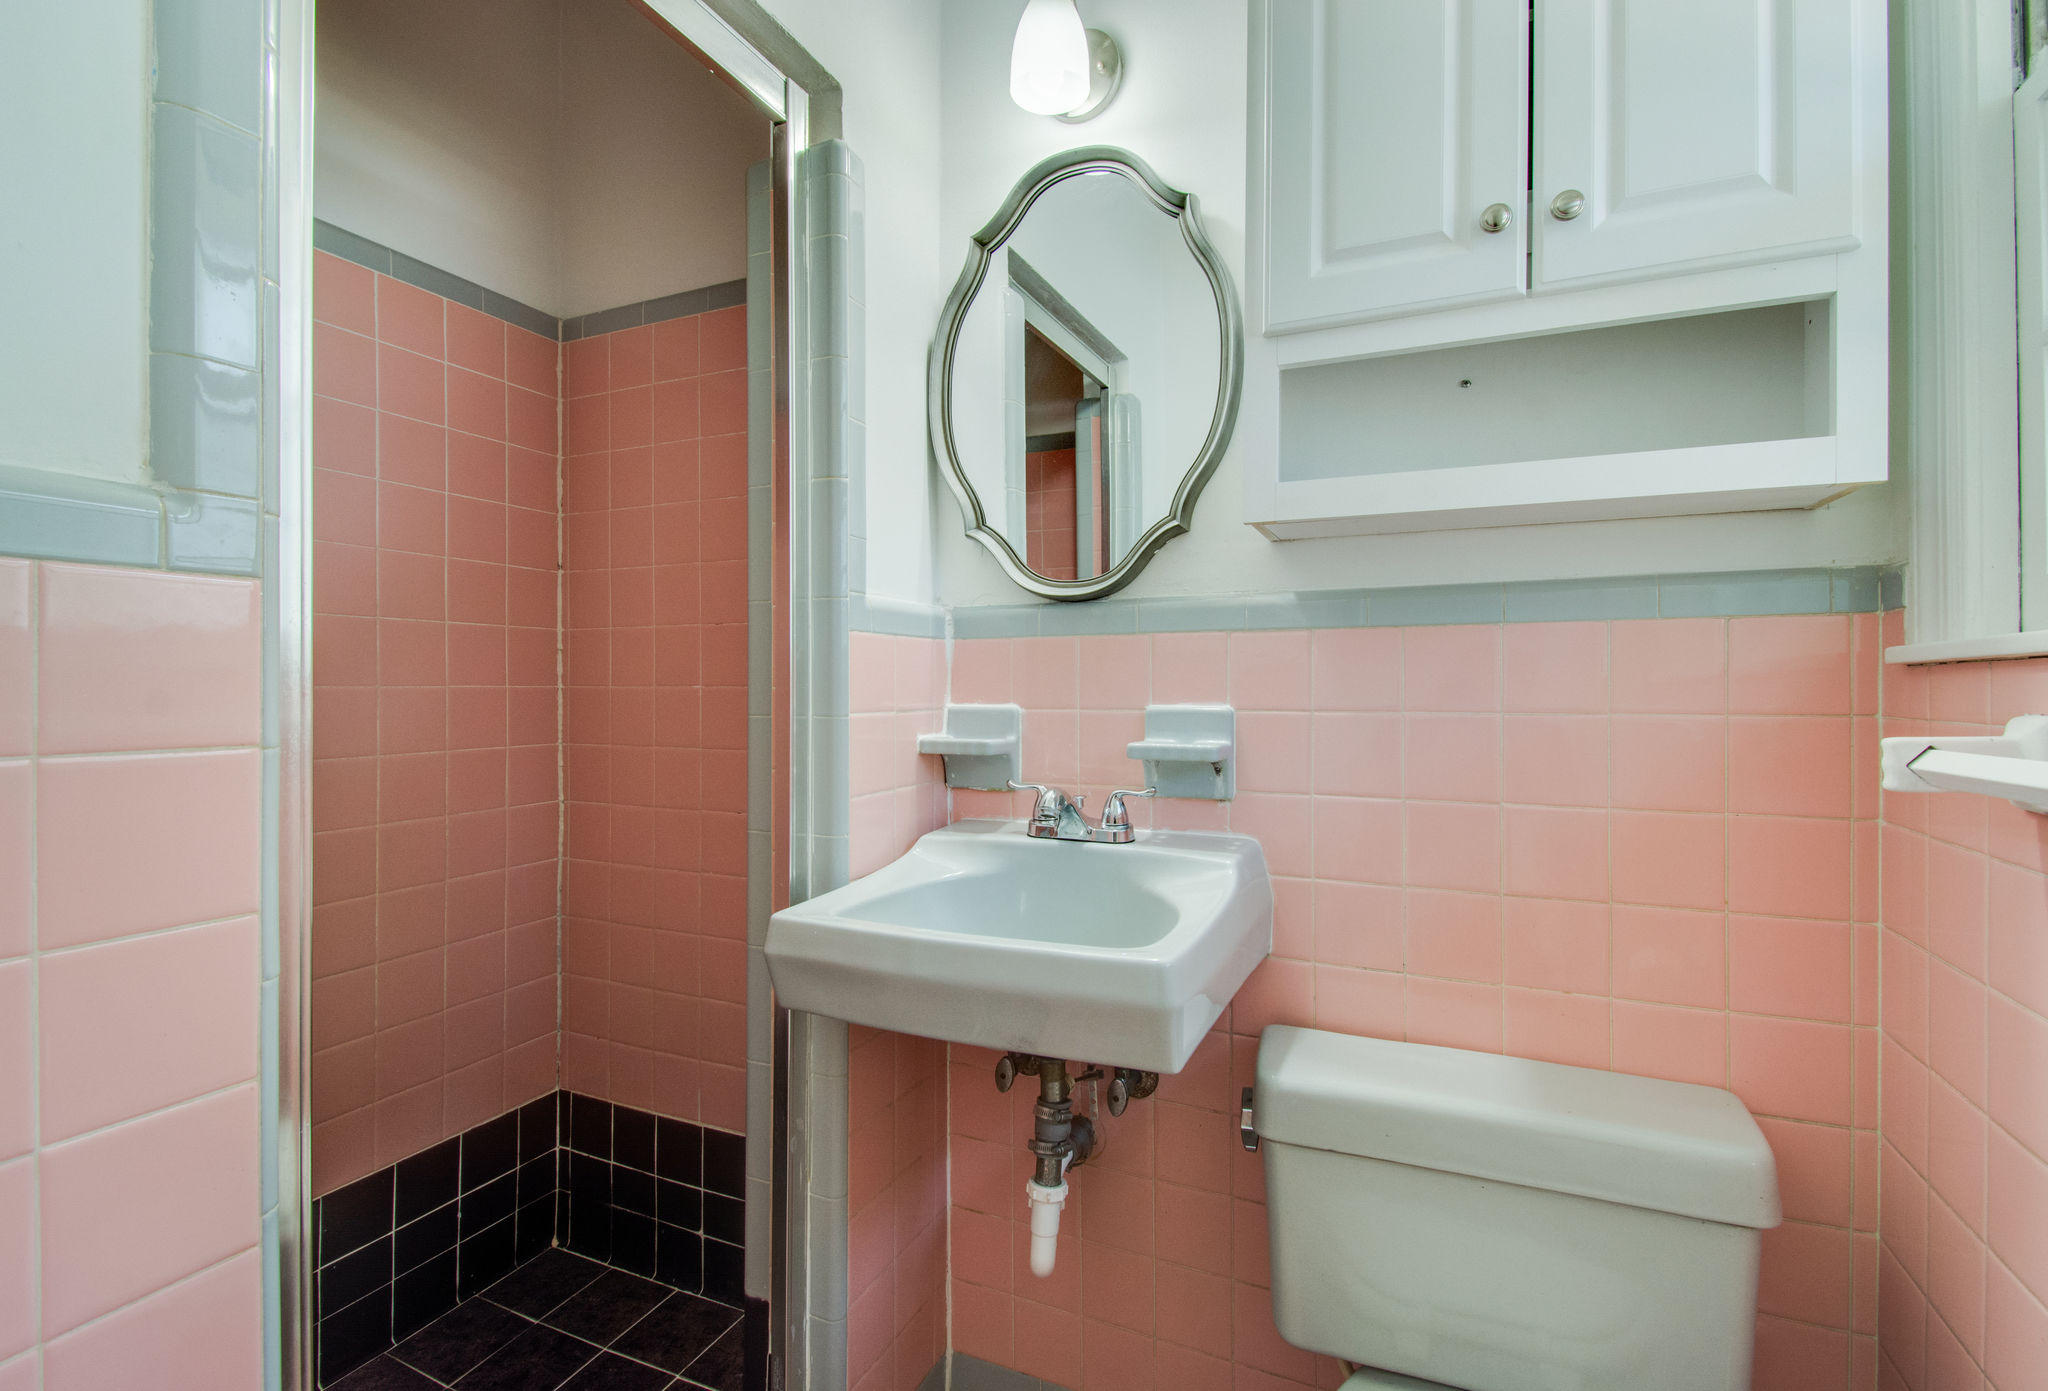 Northbridge Terrace Homes For Sale - 1114 Northbridge, Charleston, SC - 13